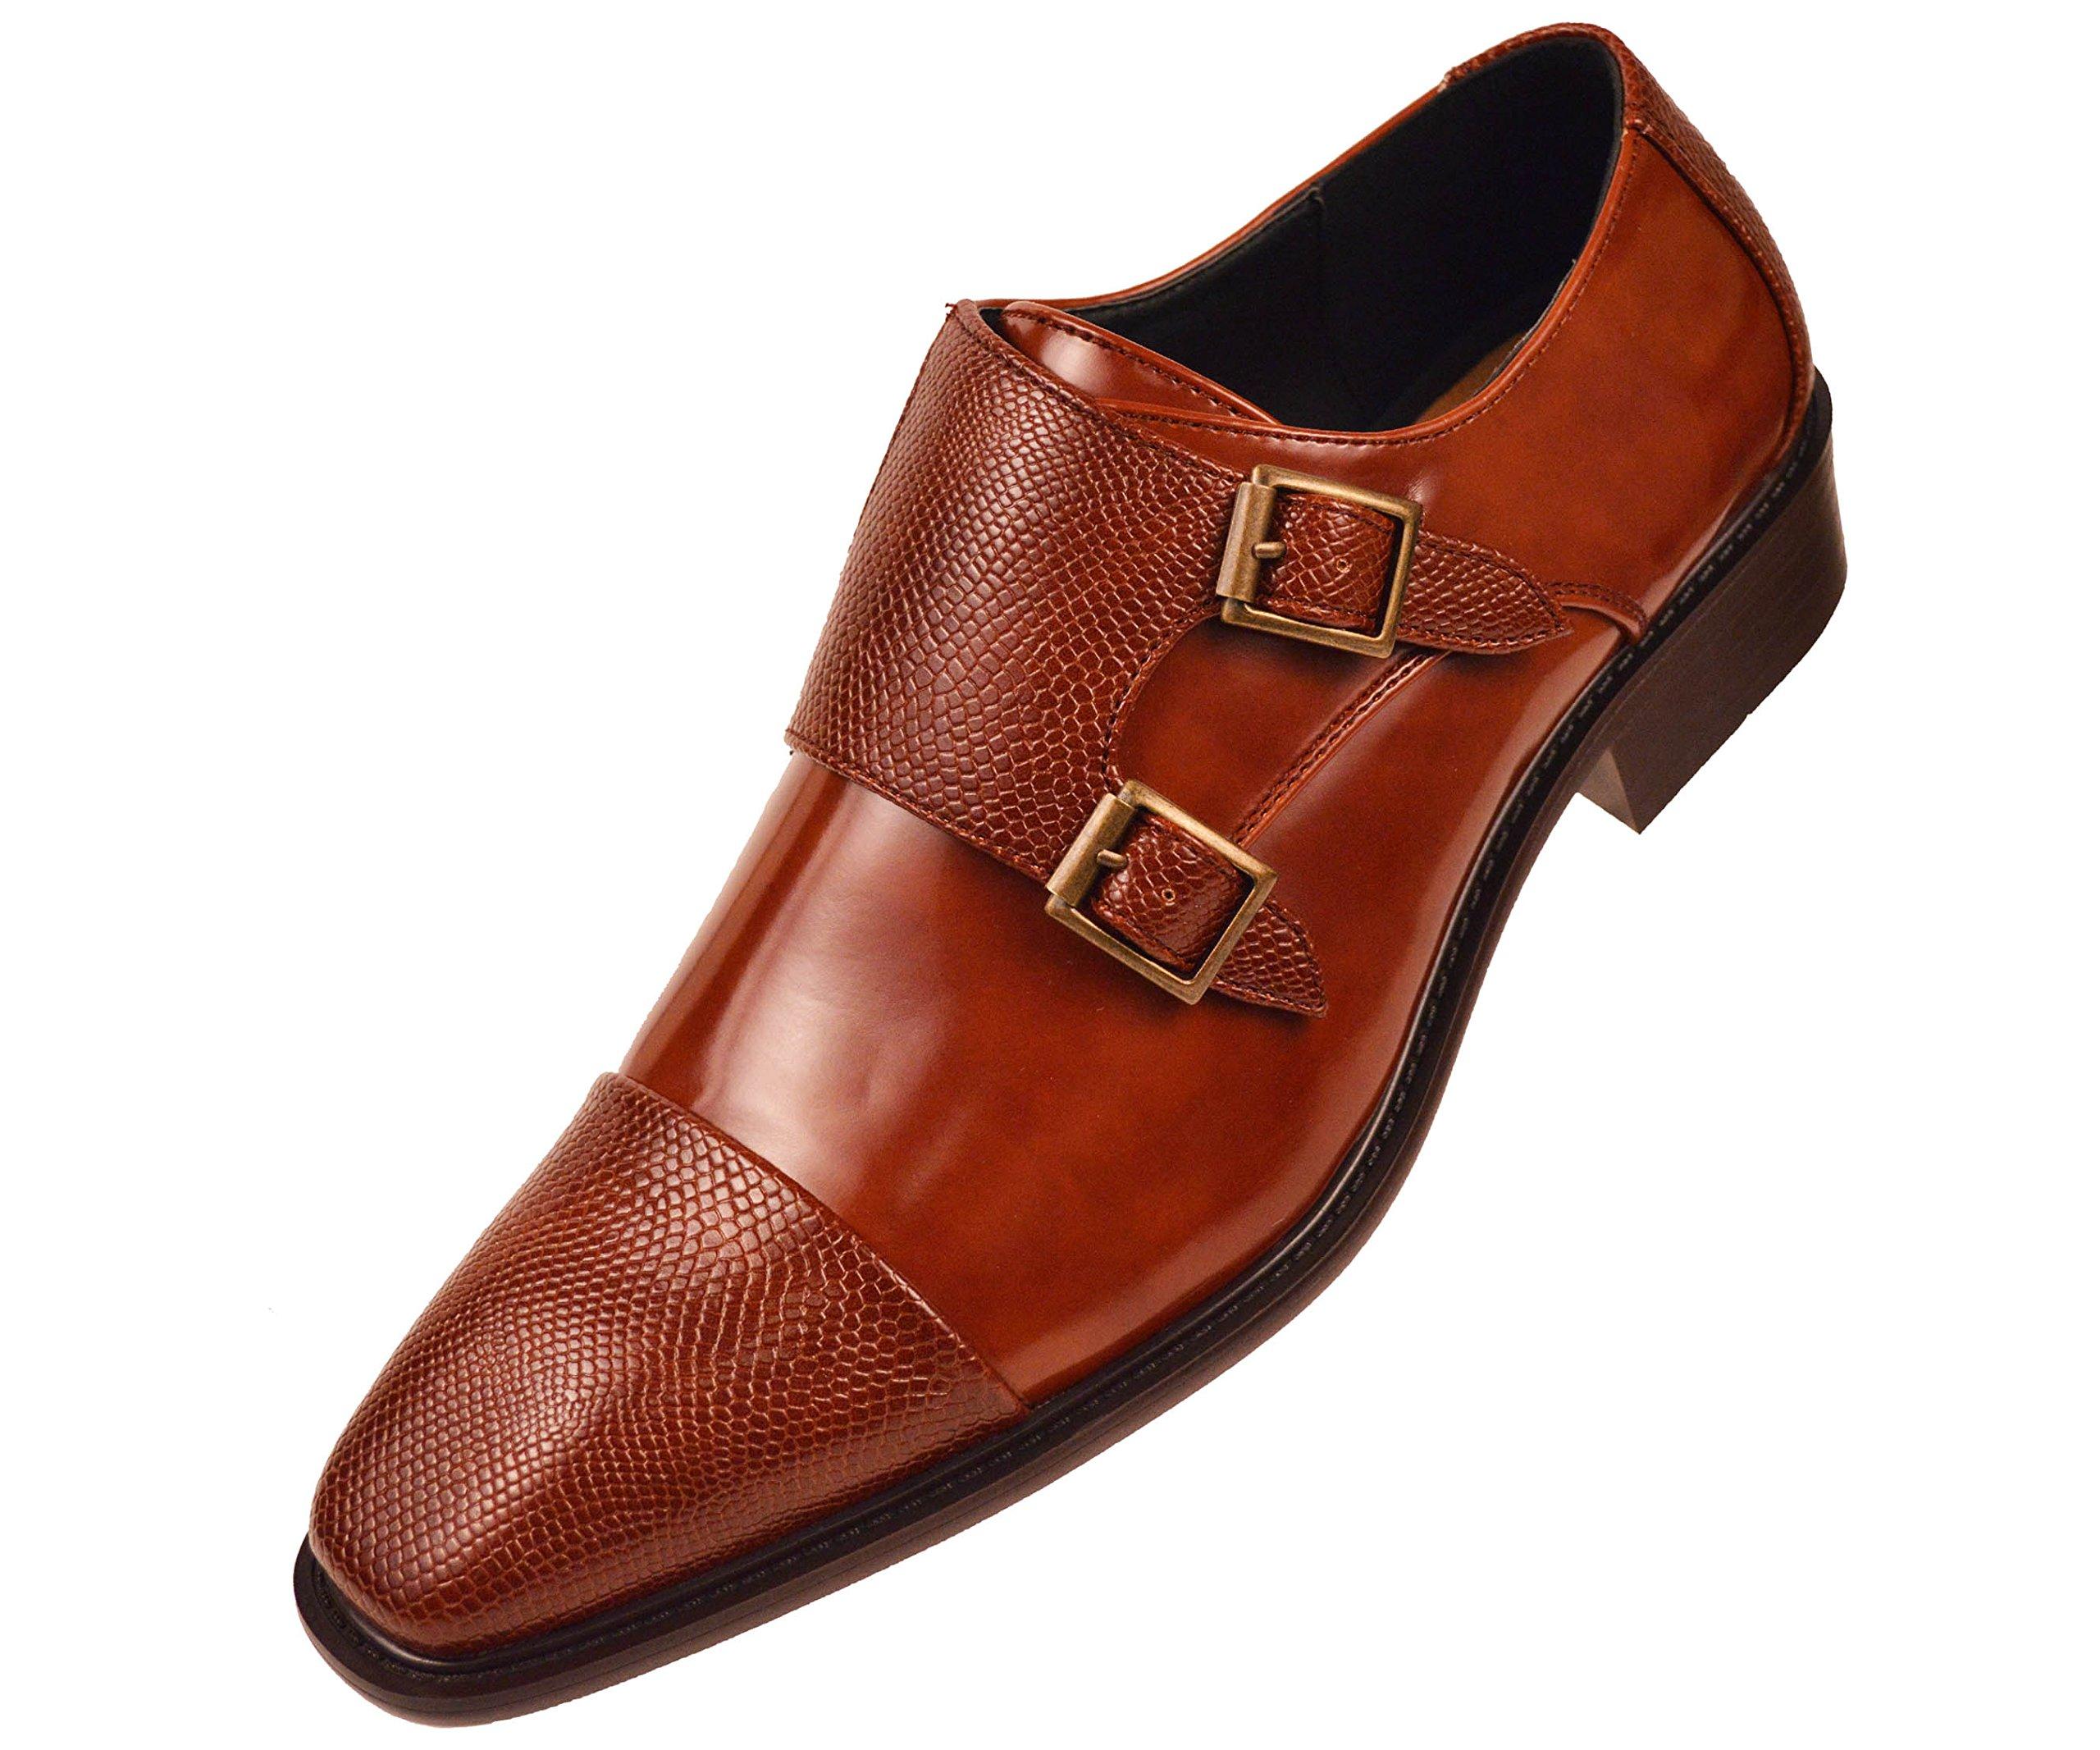 Bolano Mens Cognac Brown Smooth Double Monk Strap Dress Shoe Embossed Strap and Cap Toe: Bancroft-215 , Cognac , 14 D(M) US